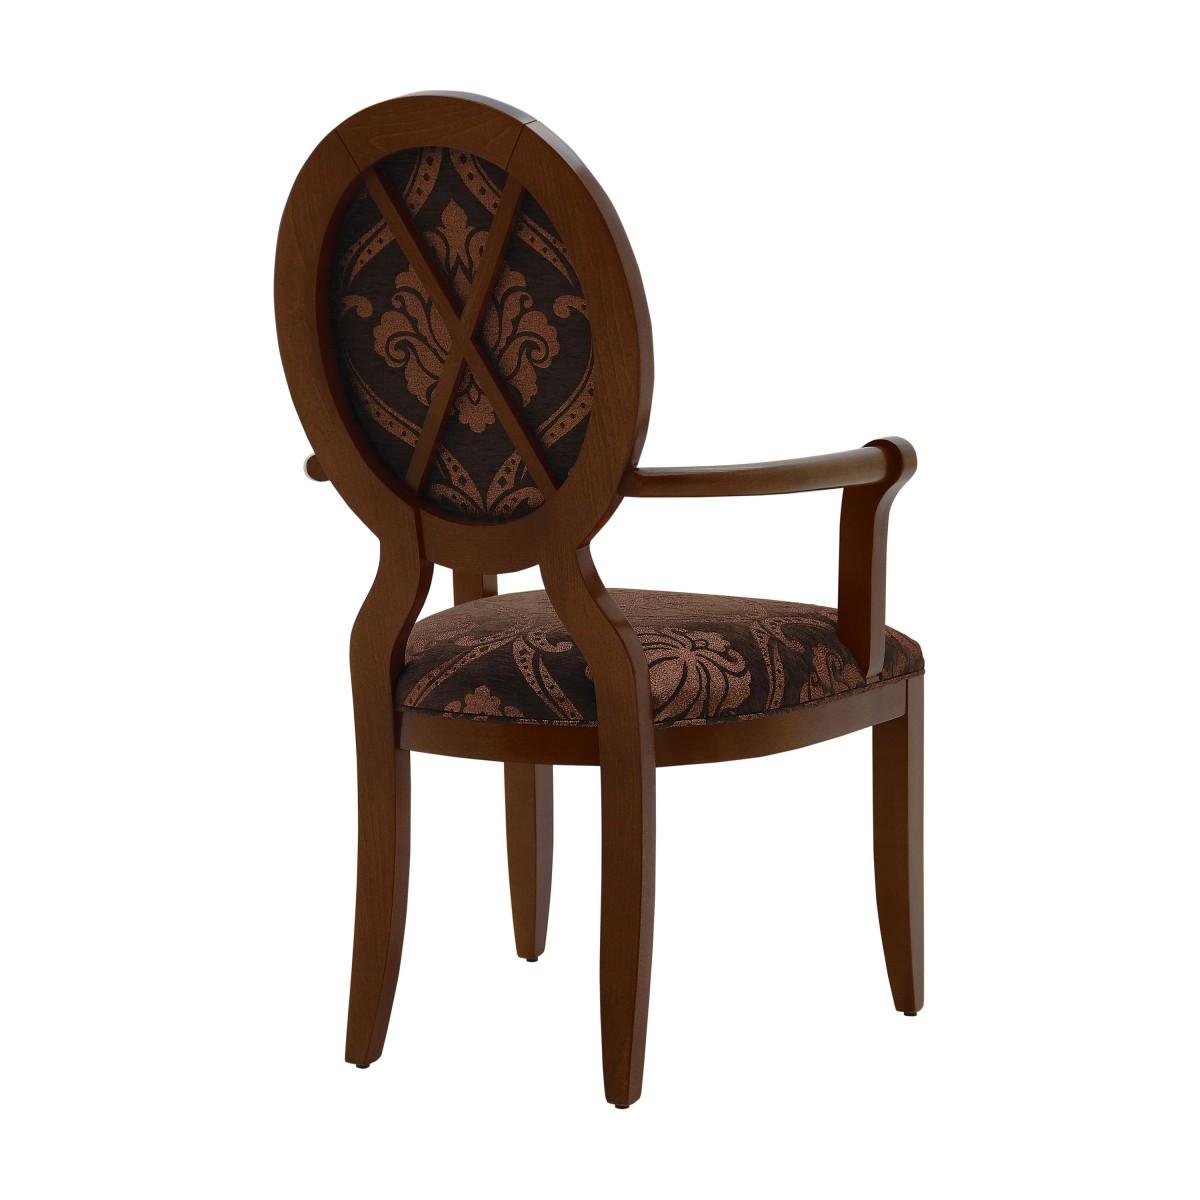 Small armchair Anello - Sevensedie